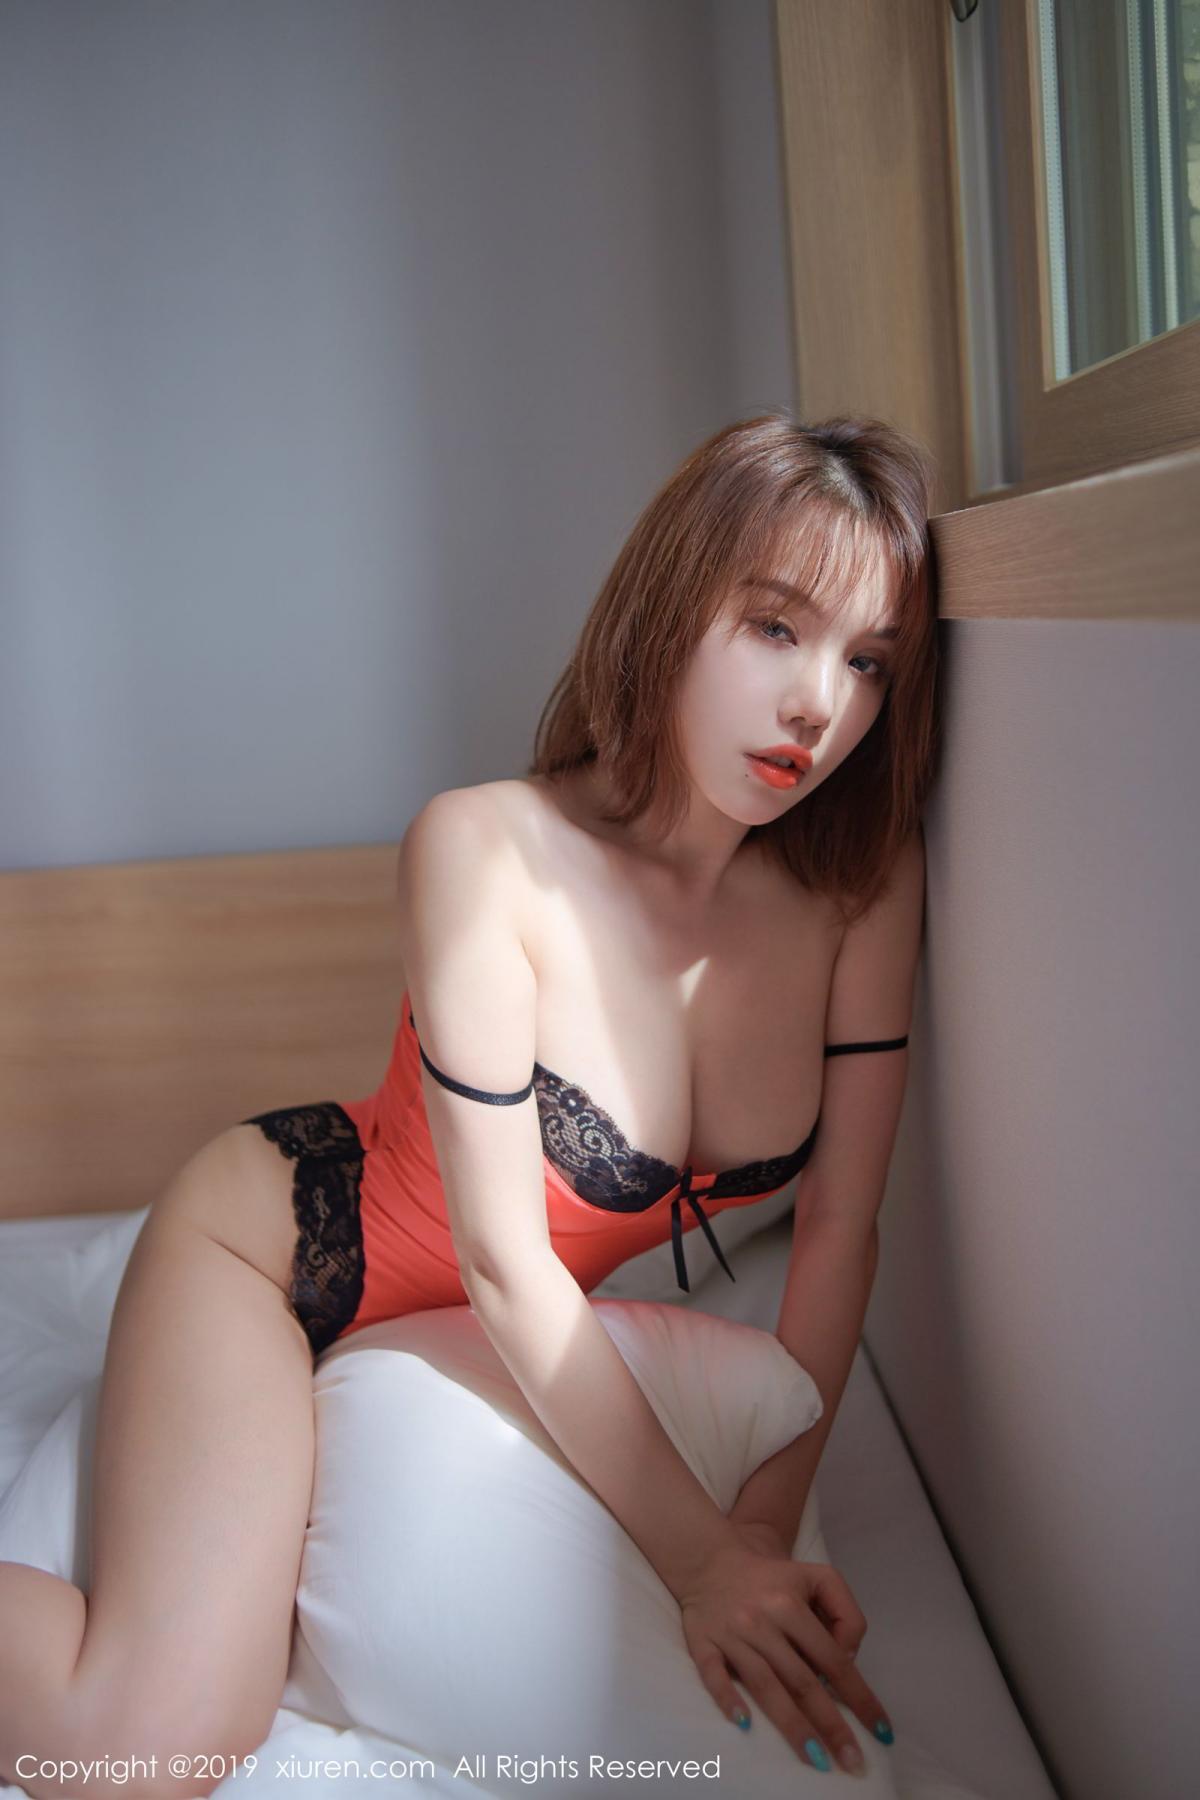 [XiuRen] Vol.1684 Huang Le Ran 38P, Huang Le Ran, Underwear, Xiuren